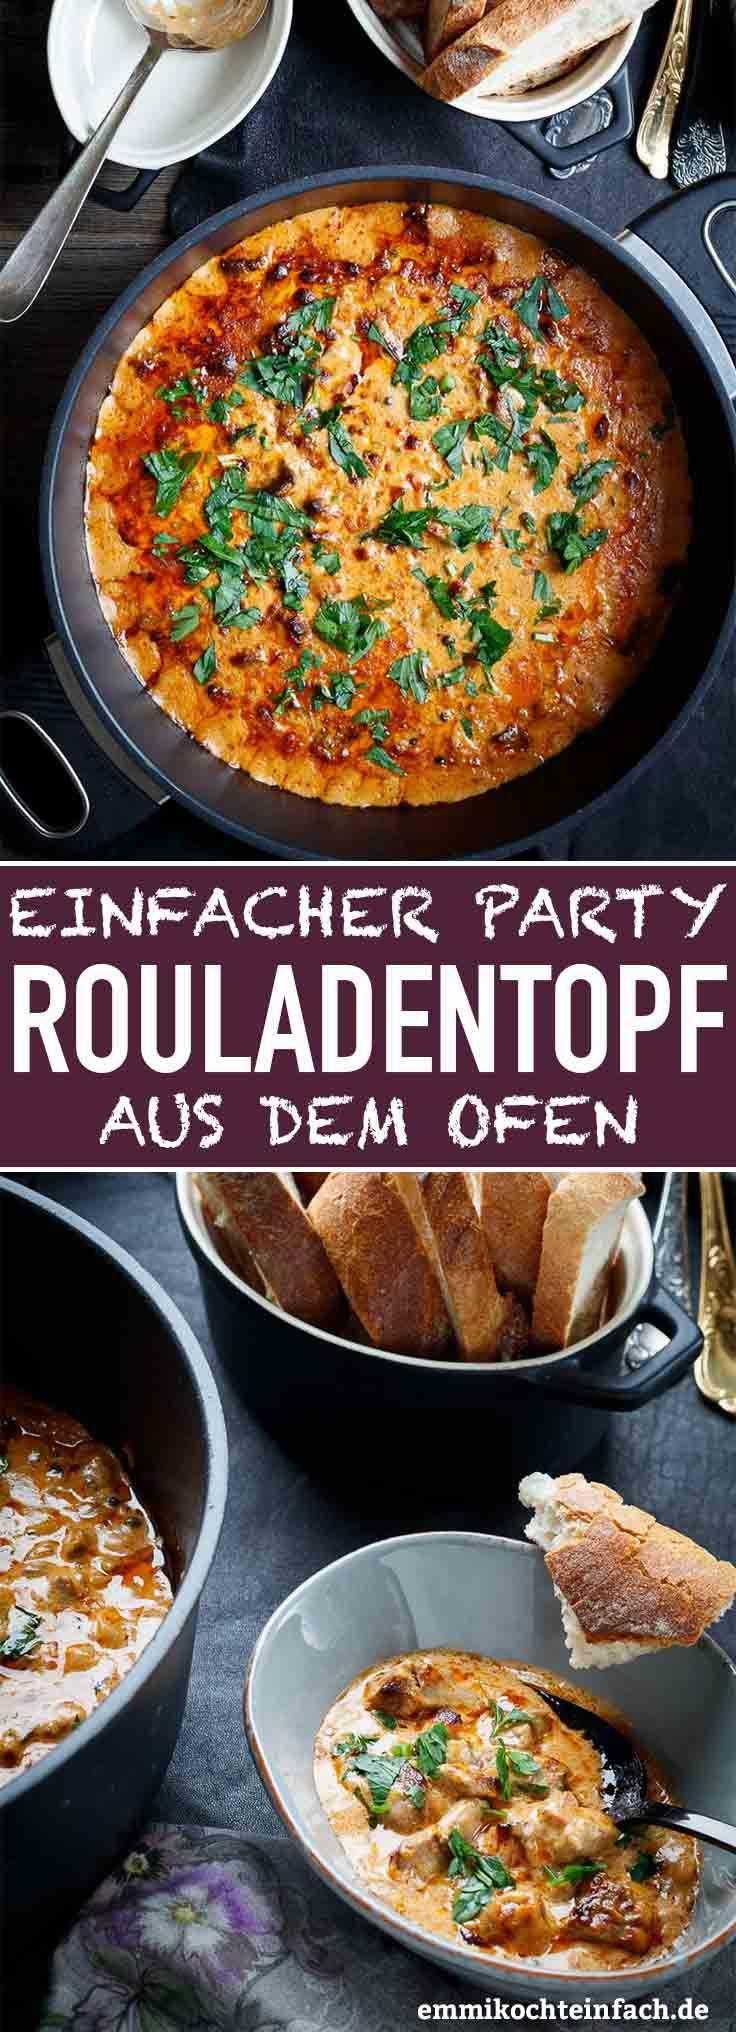 Einfacher Party Rouladentopf à la Ute - emmikochteinfach